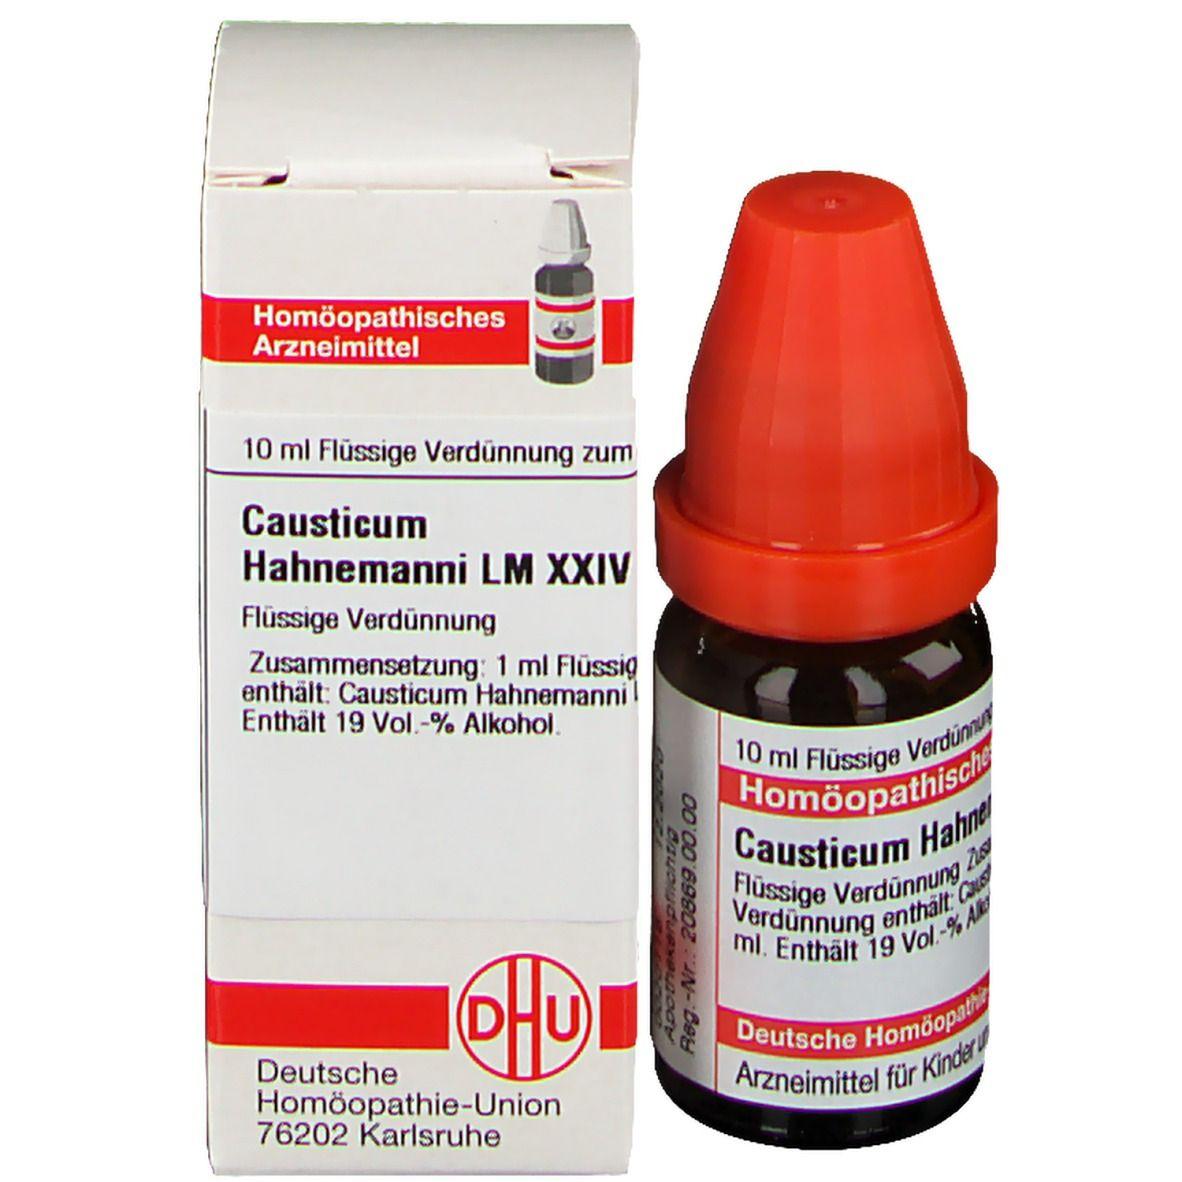 DHU Causticum Hahnemanni LM XXIV